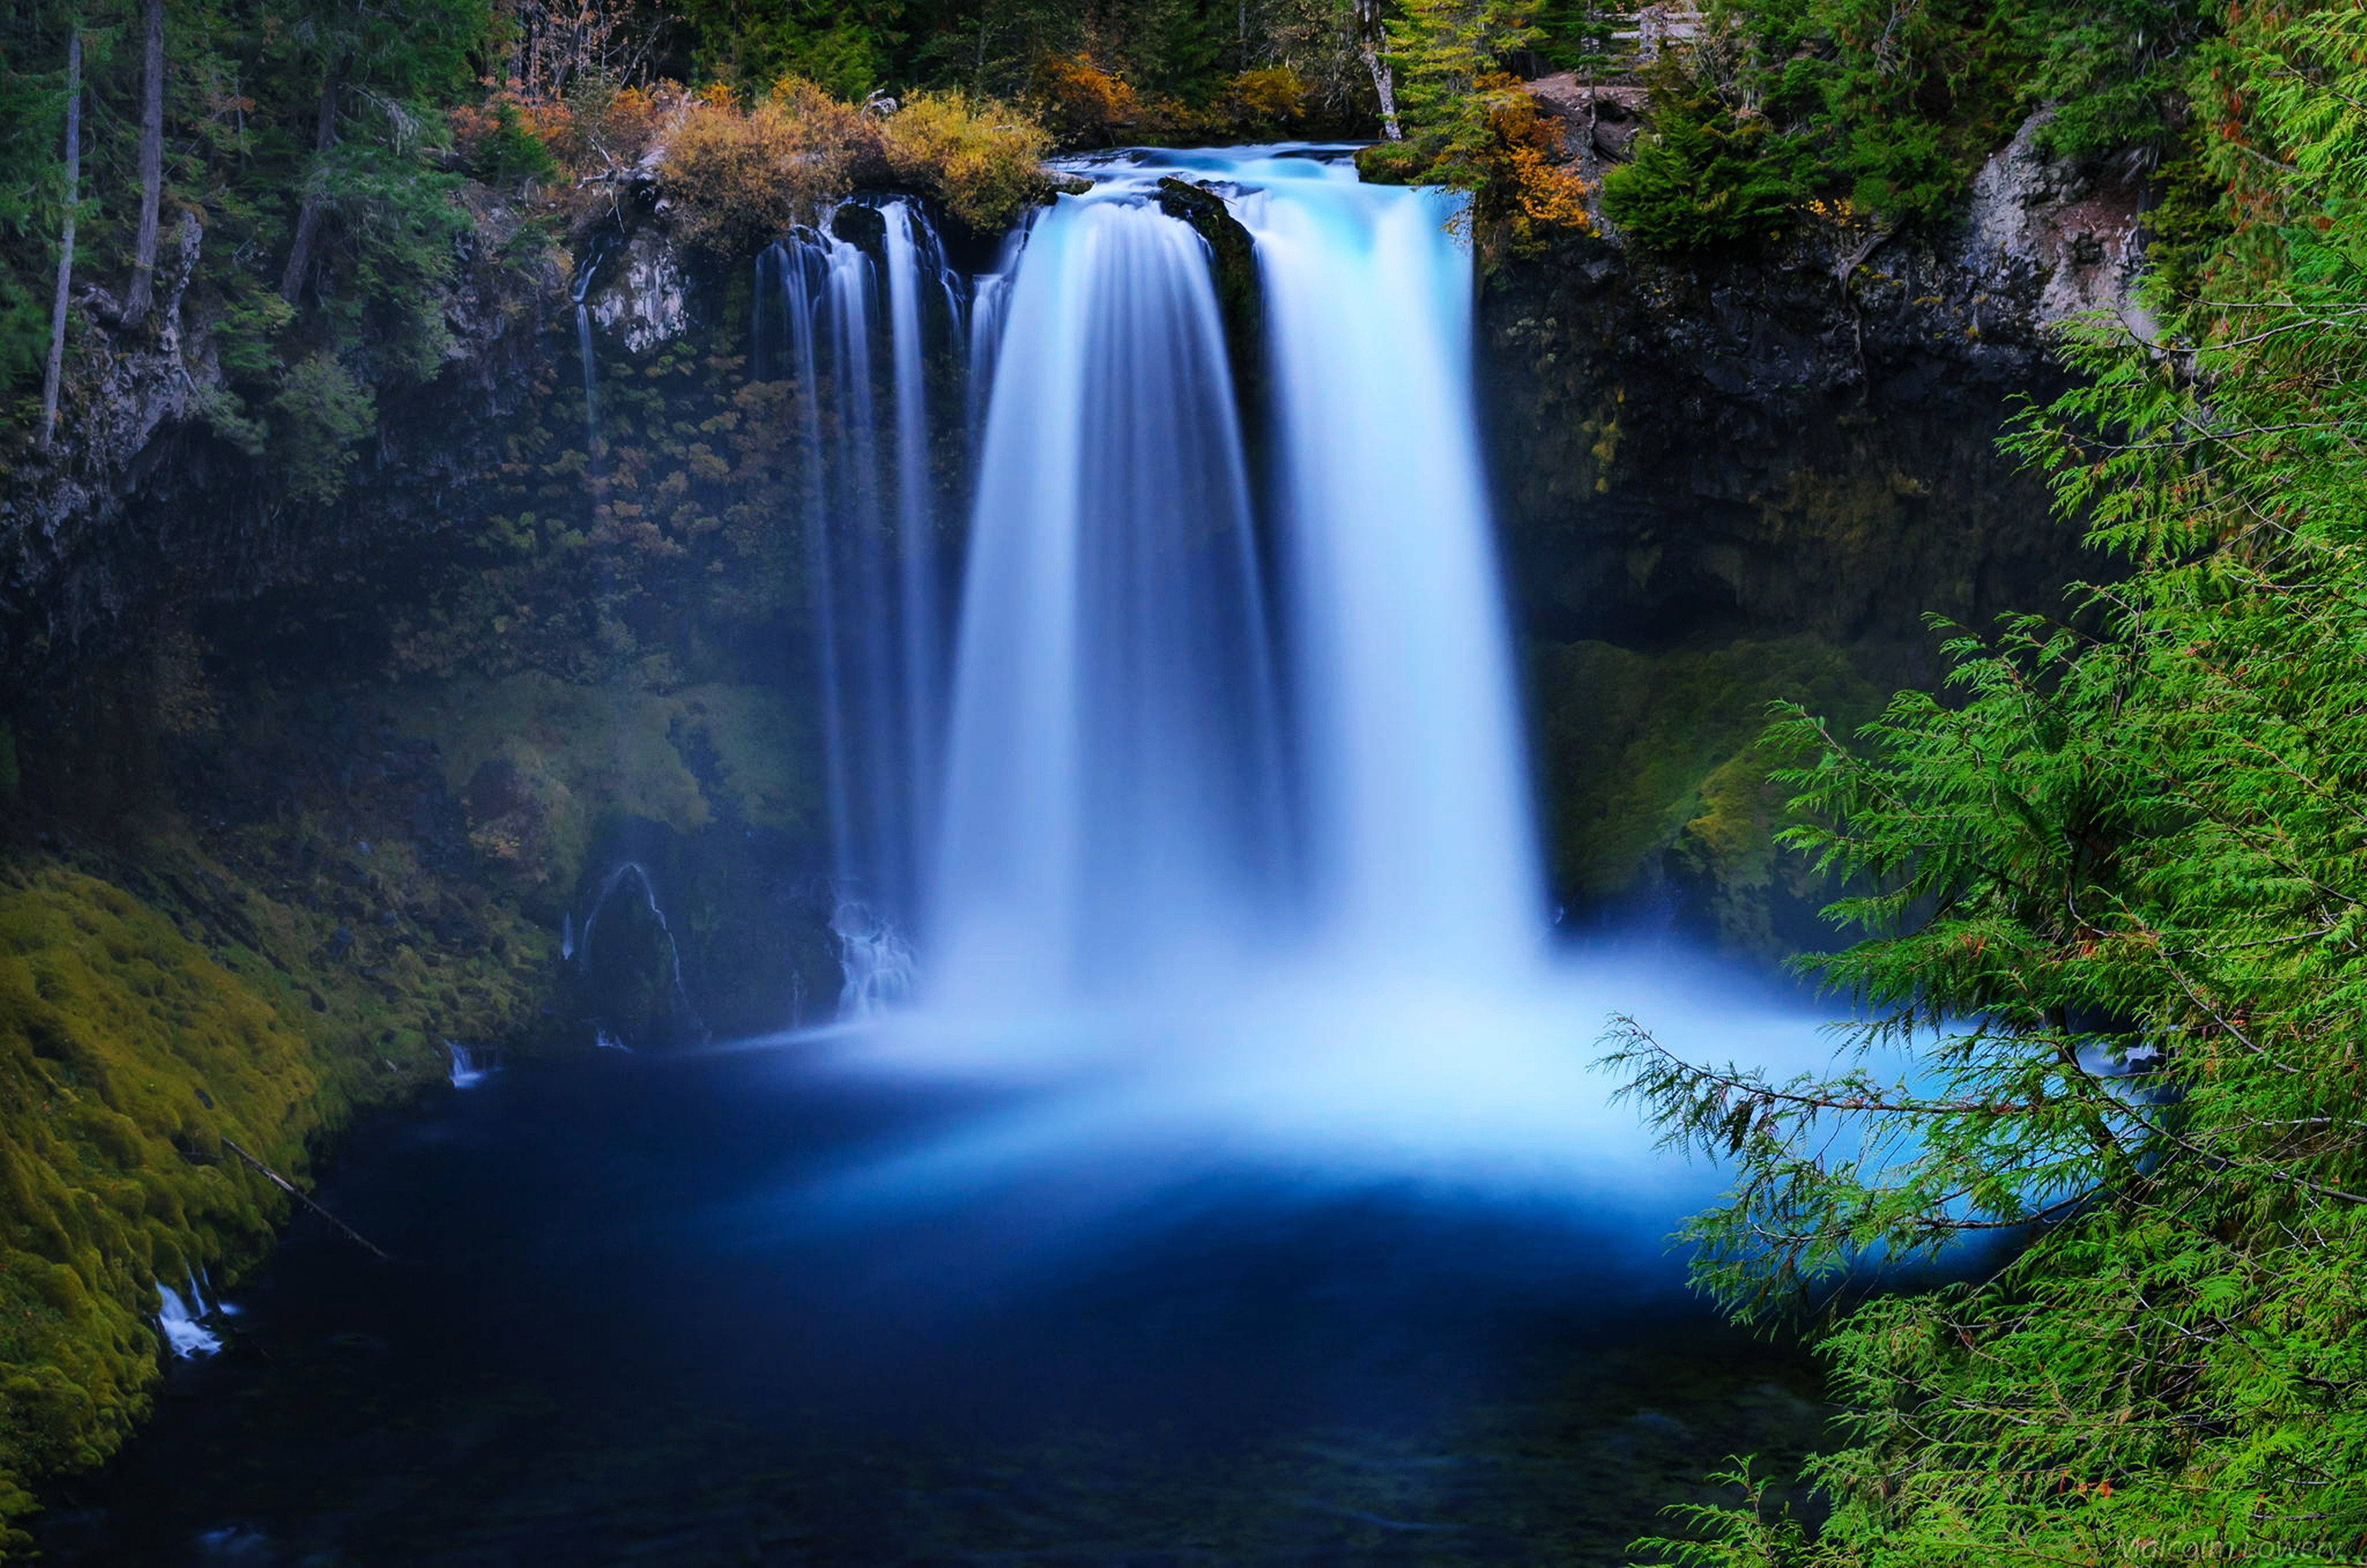 Waterfall 4k Ultra HD Wallpaper | Background Image ...